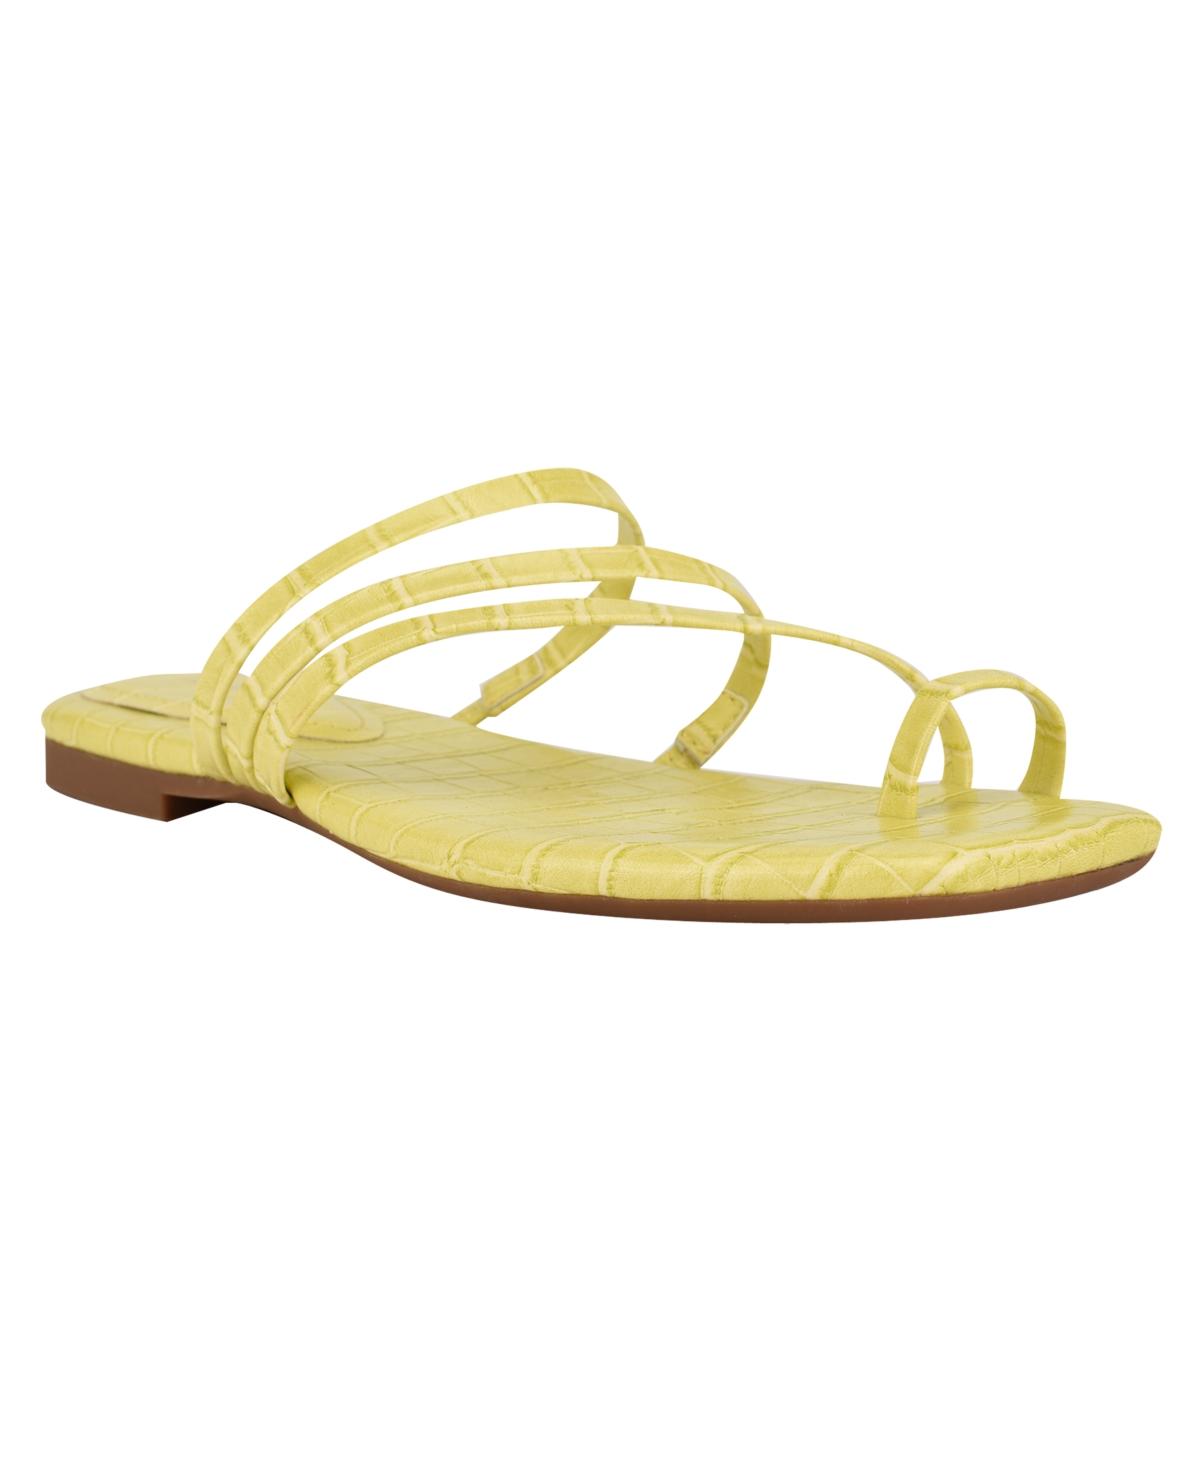 Nine West Women's Darbie Square Toe Toe-Ring Sandals Women's Shoes